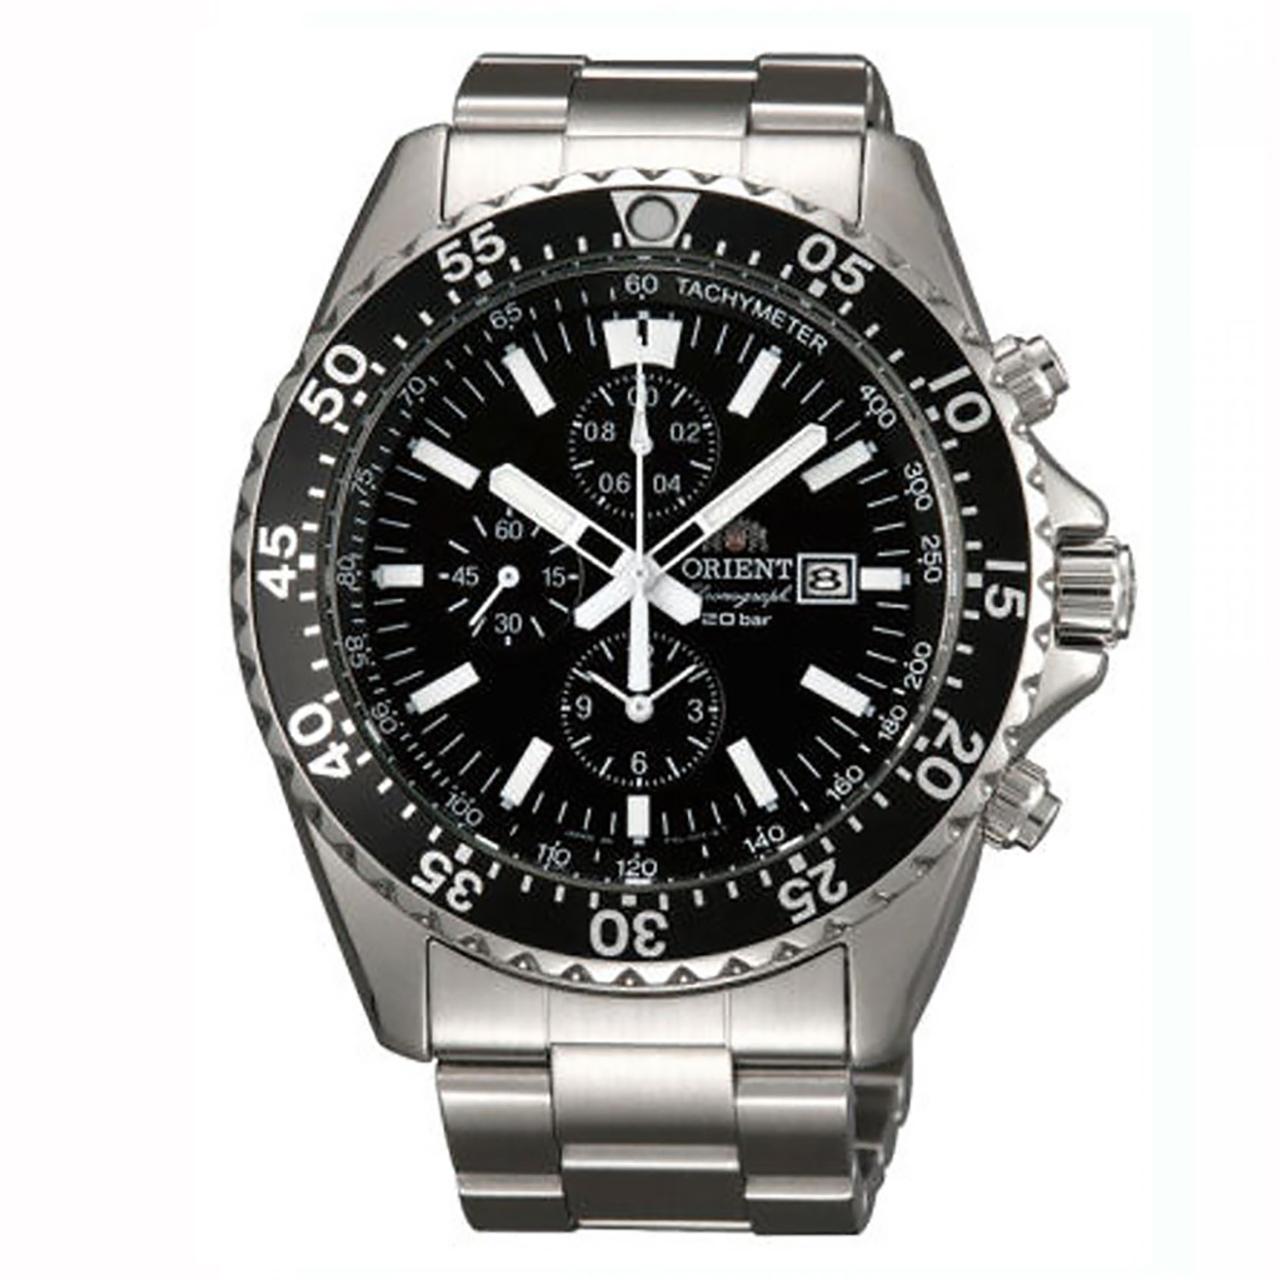 ساعت مچی عقربه ای مردانه  اورینت مدل STT11002B0 45